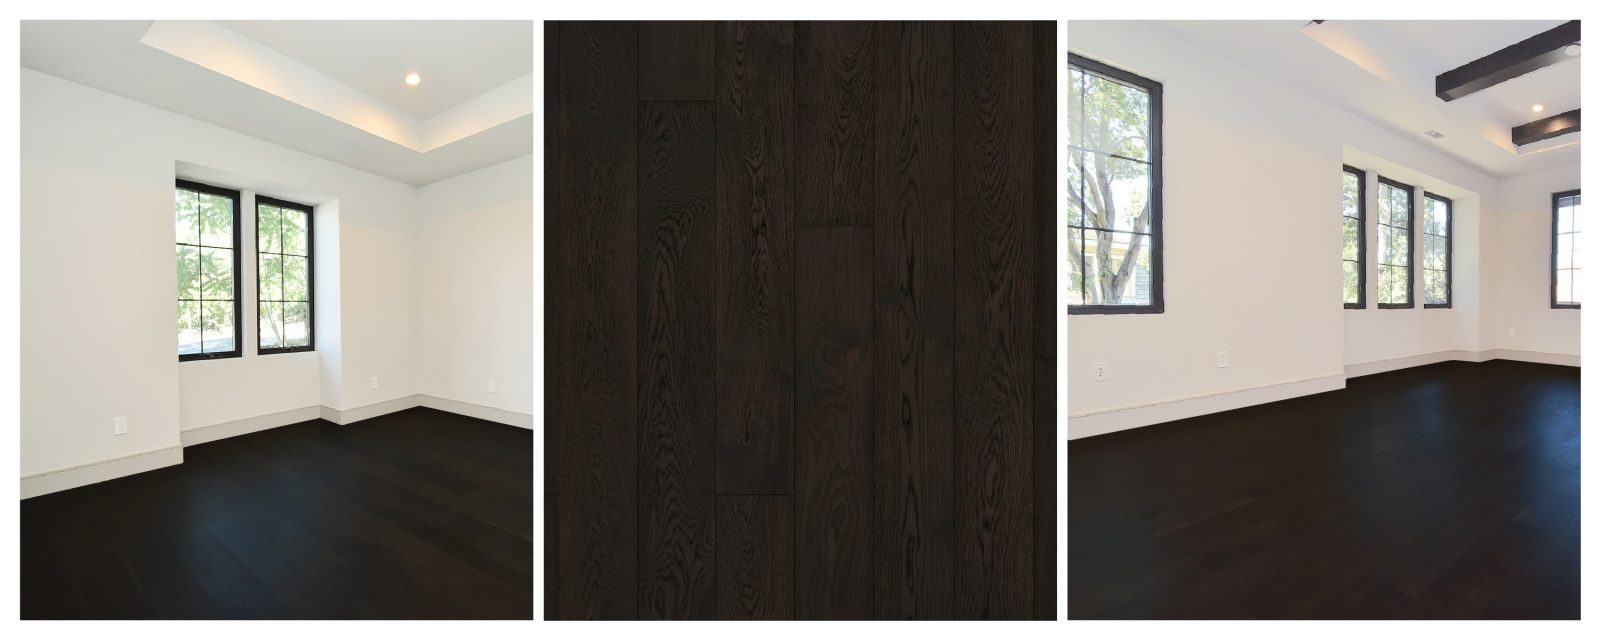 Hardwood Floor Trend - Black Hardwood Flooring